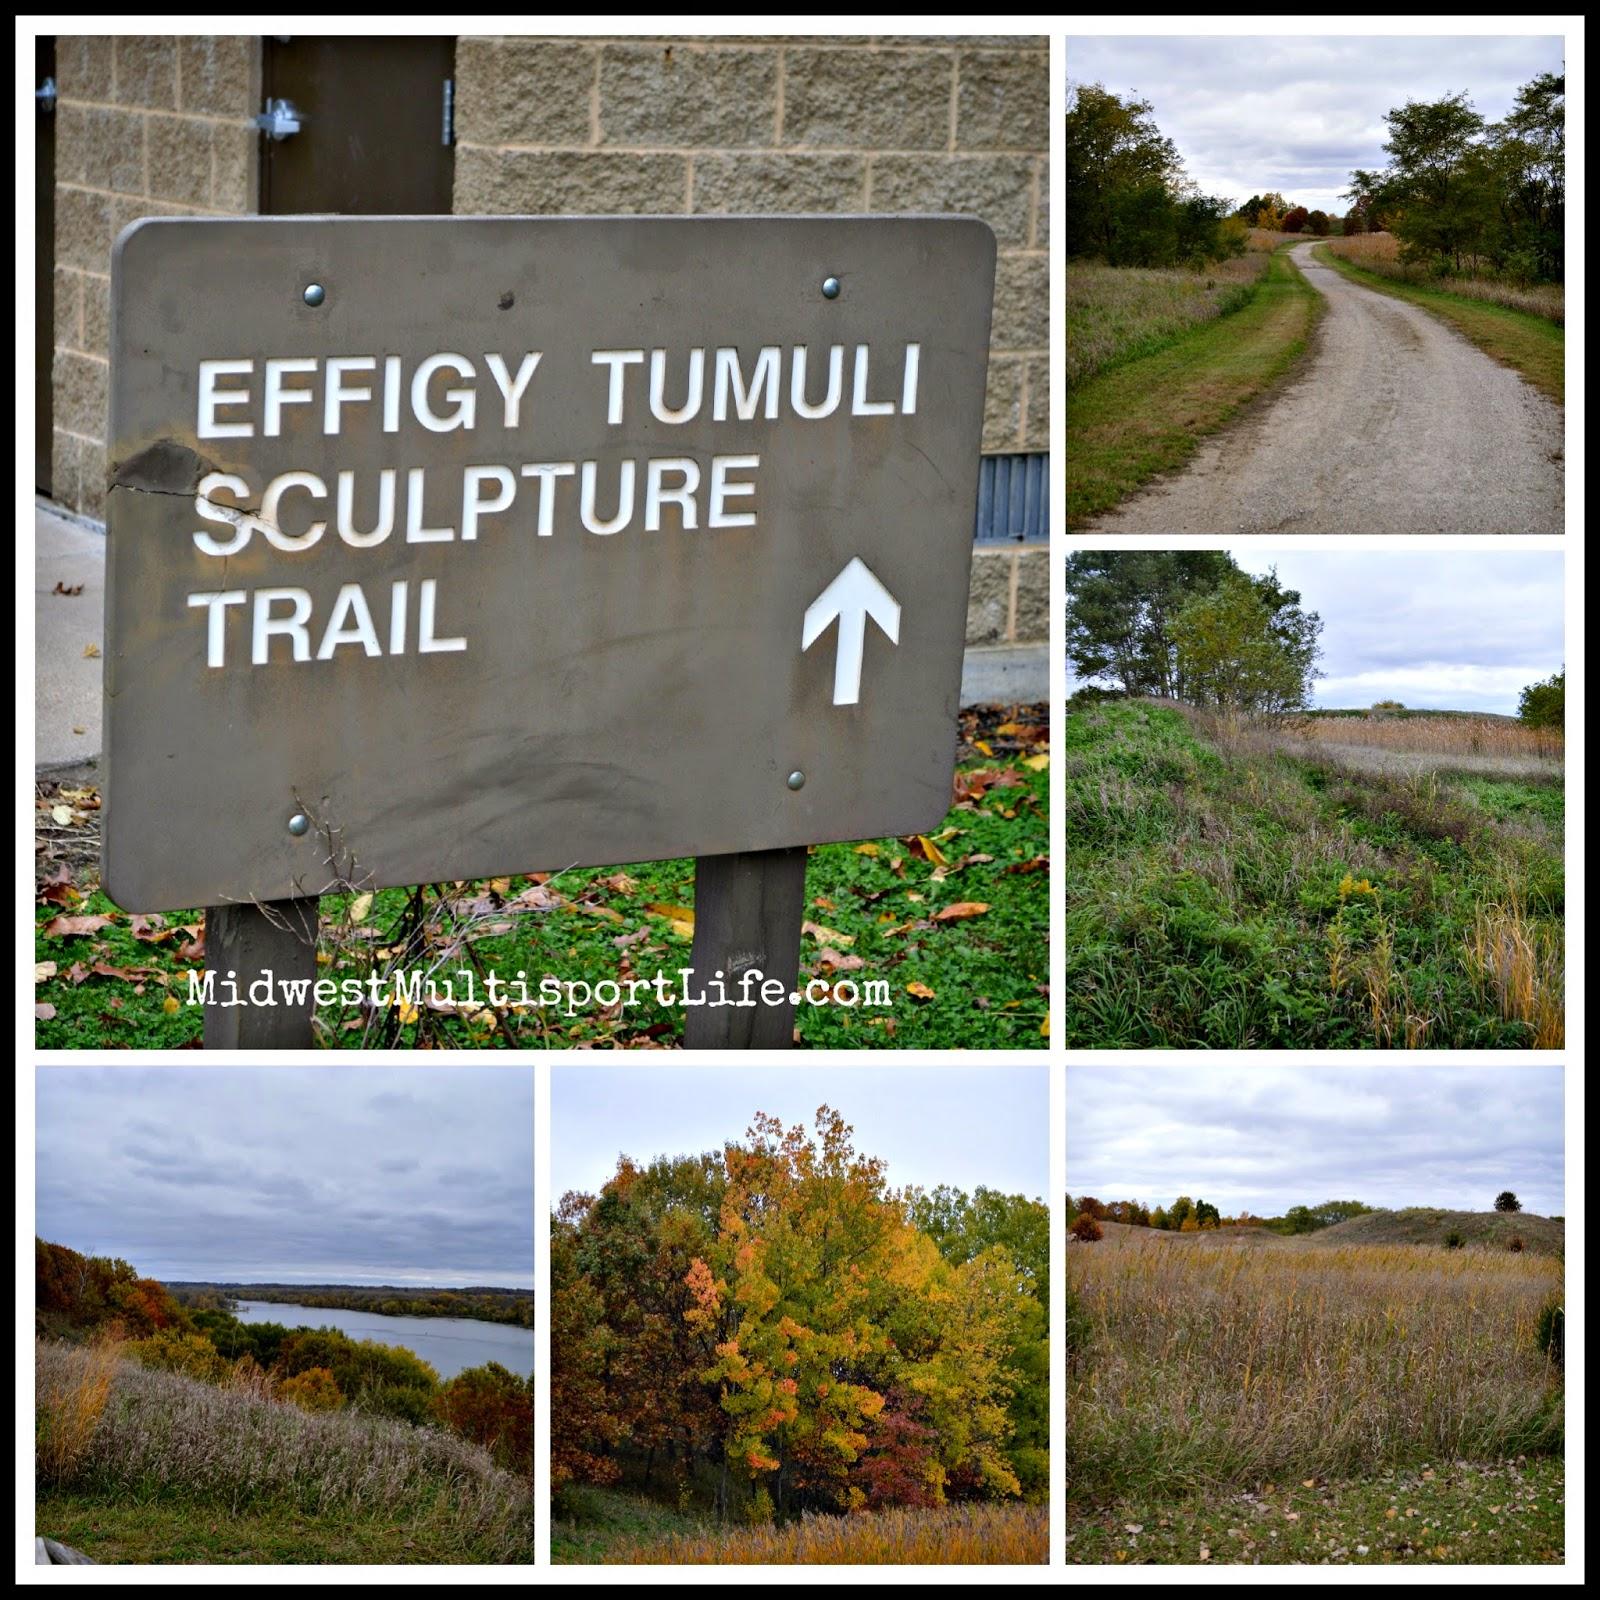 Effigy Tumuli Trail